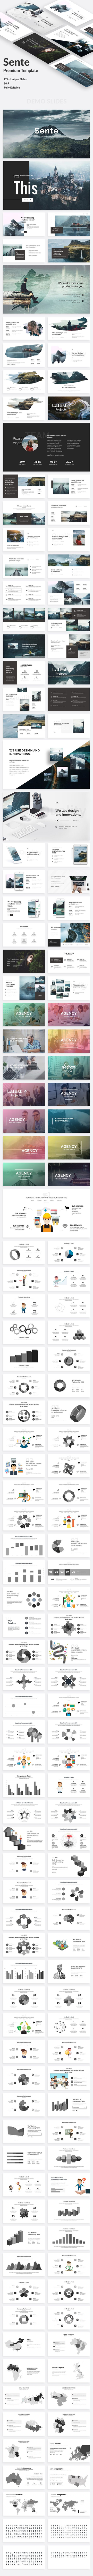 Sente Premium Design Keynote Template - Creative Keynote Templates